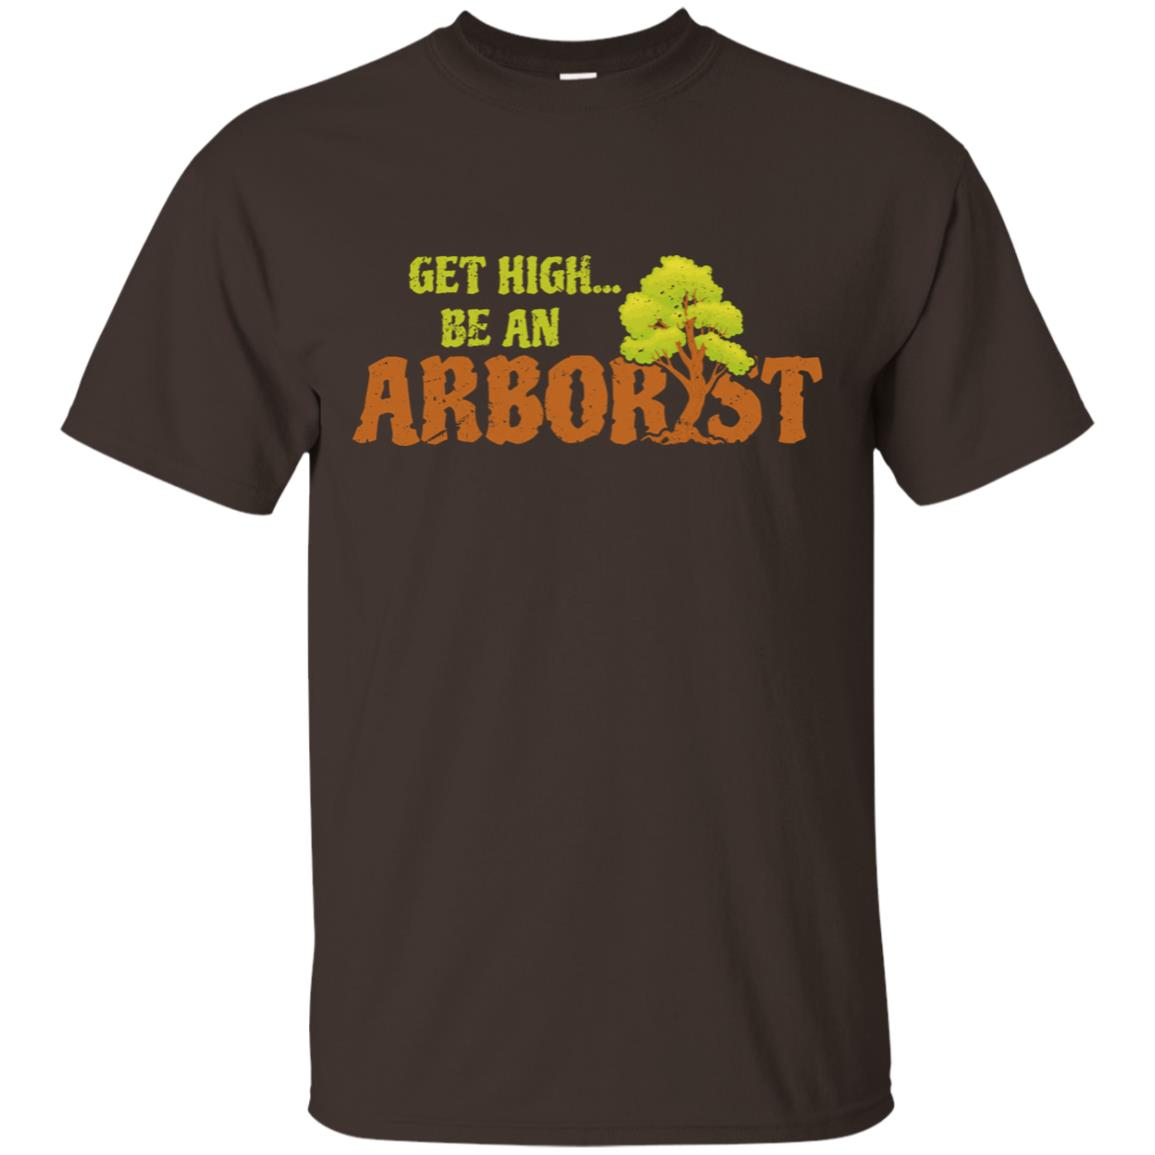 Funny Arborist – Get High Be An Arborist Unisex Short Sleeve